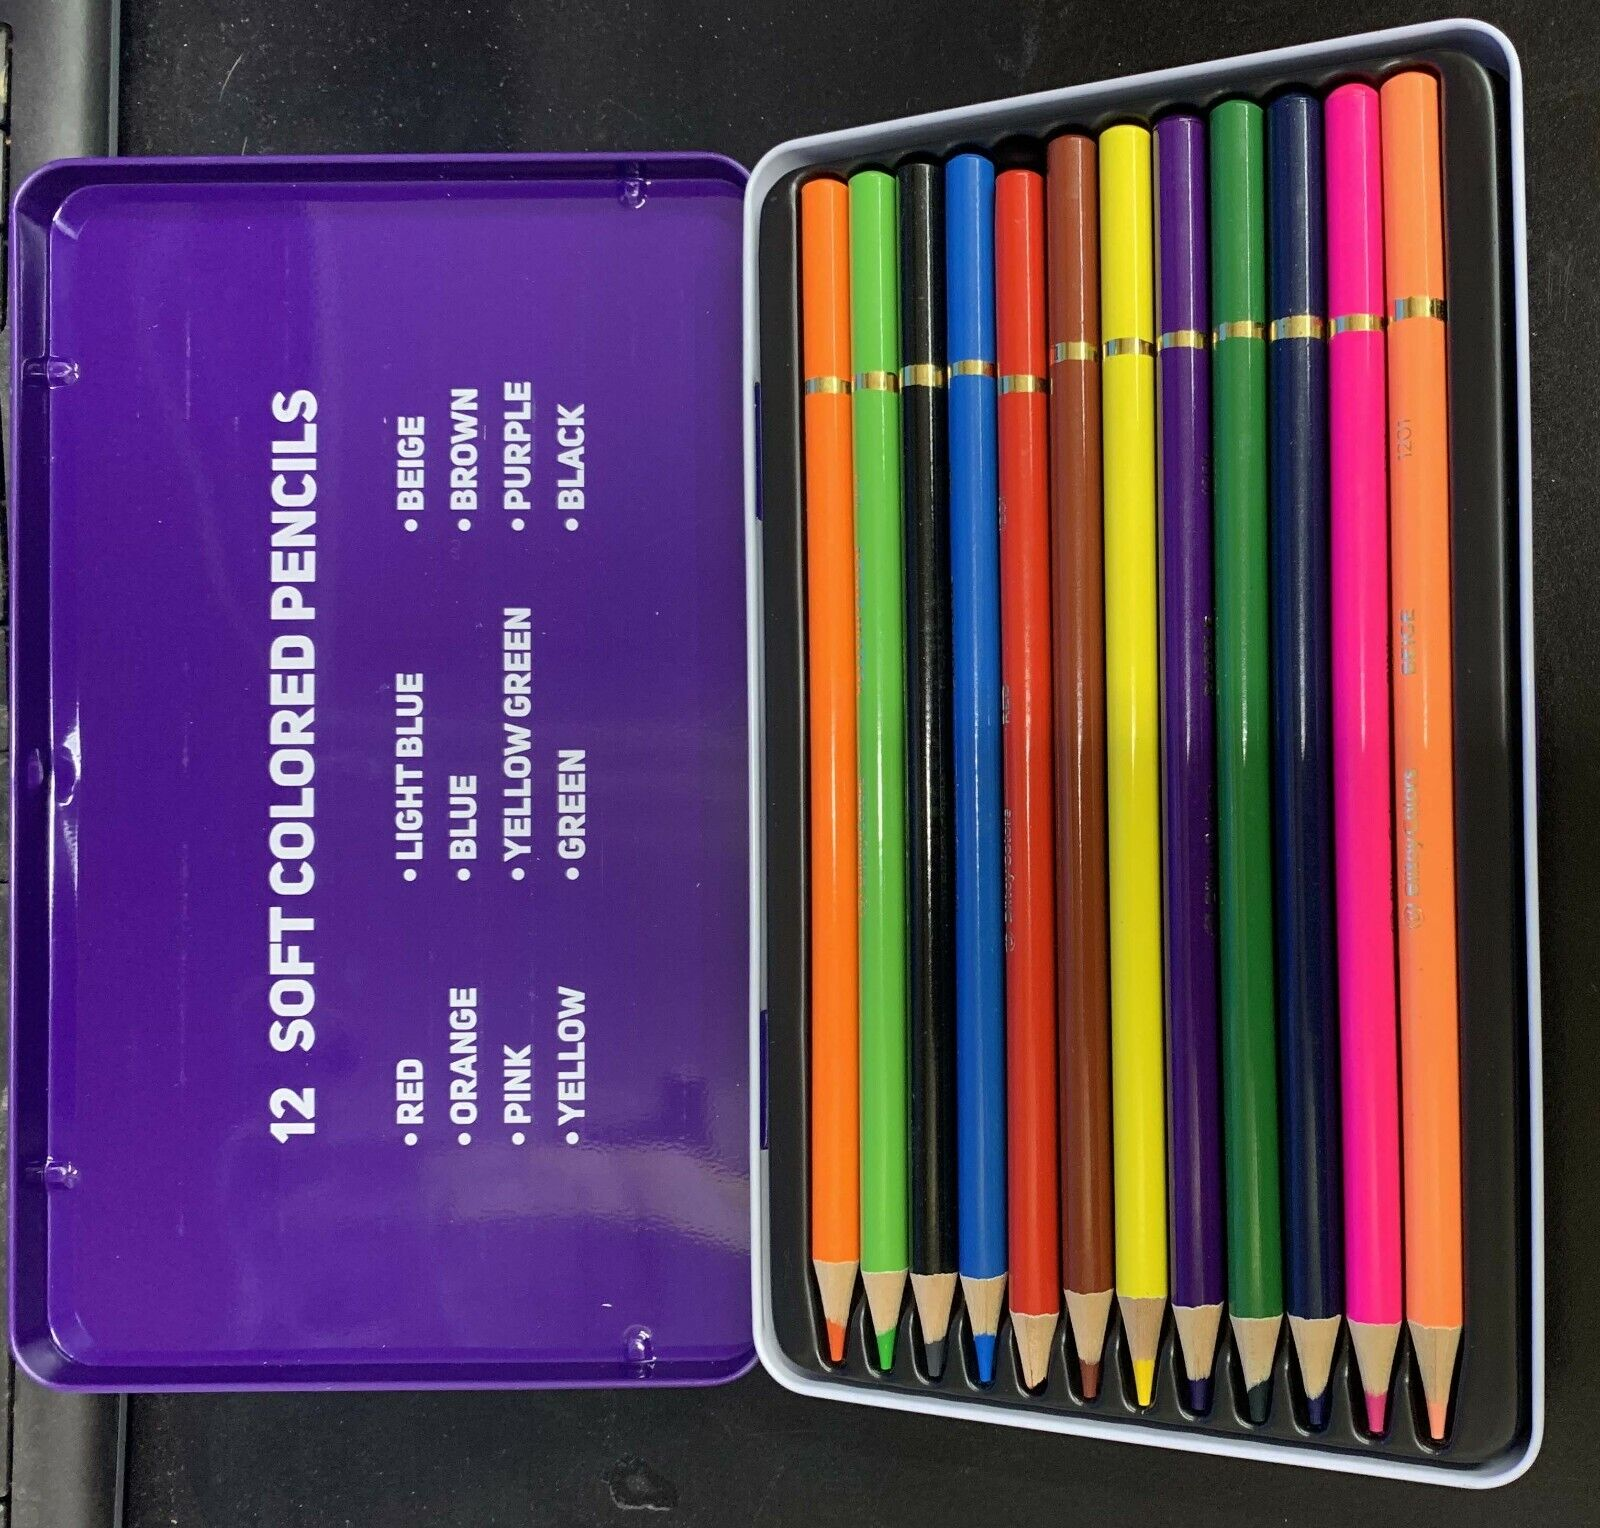 GYY Professional Colored Pencils Set 48 Color Crayon Set Portable Pencil Set of 48 Distinct Colors for Kids School Artist Adult Beginner Children Colored Pencils Set